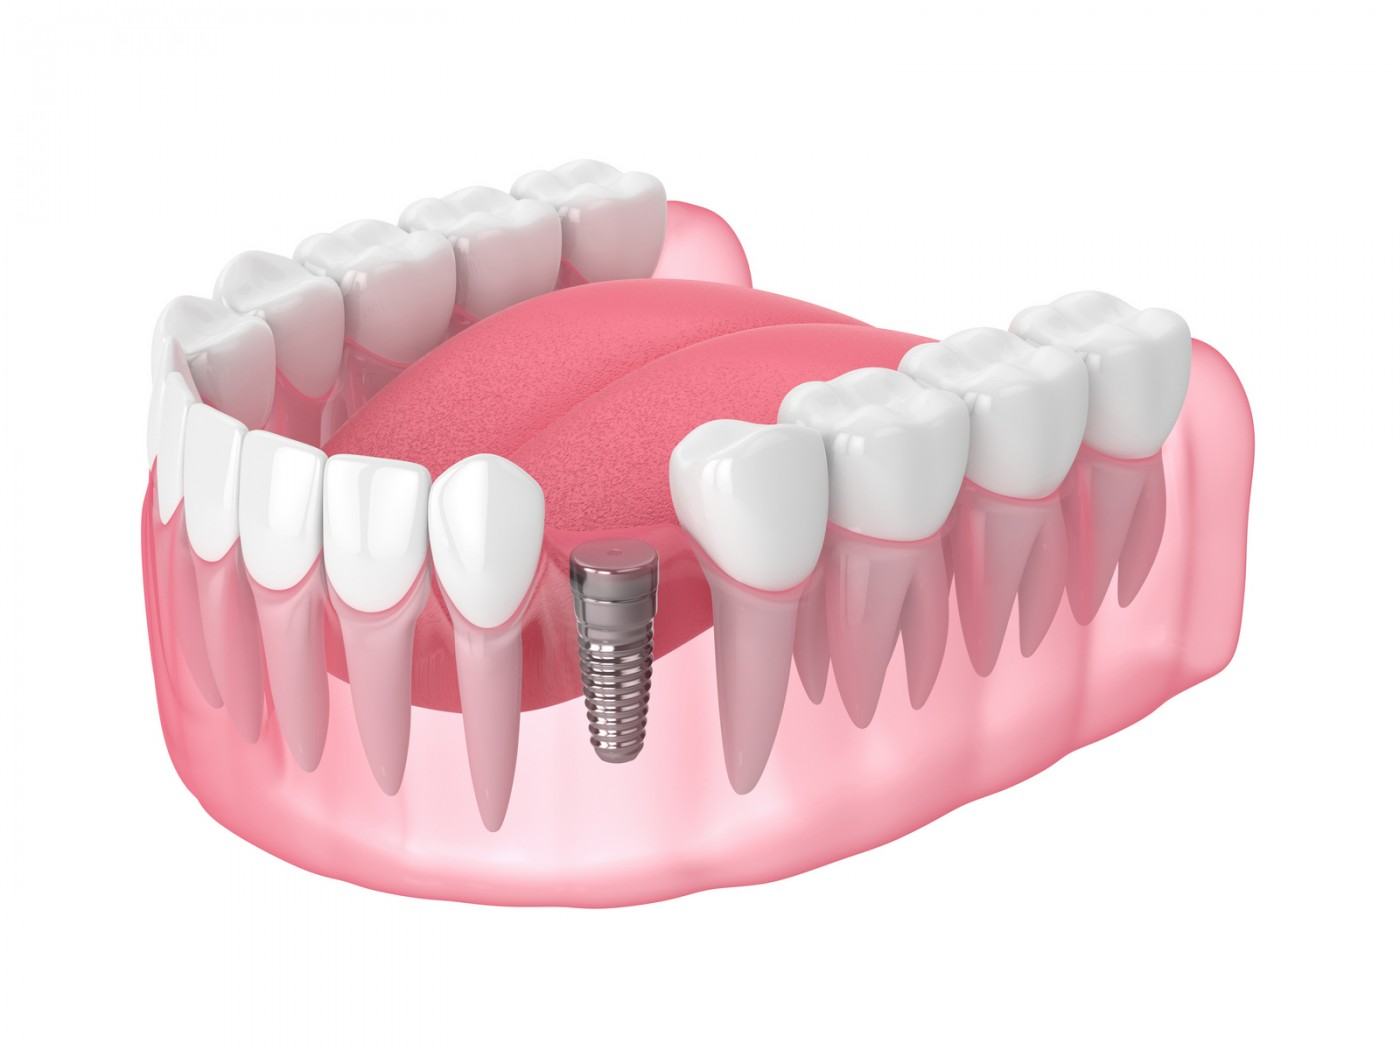 Implant dentar cu tehnologii avansate Targoviste